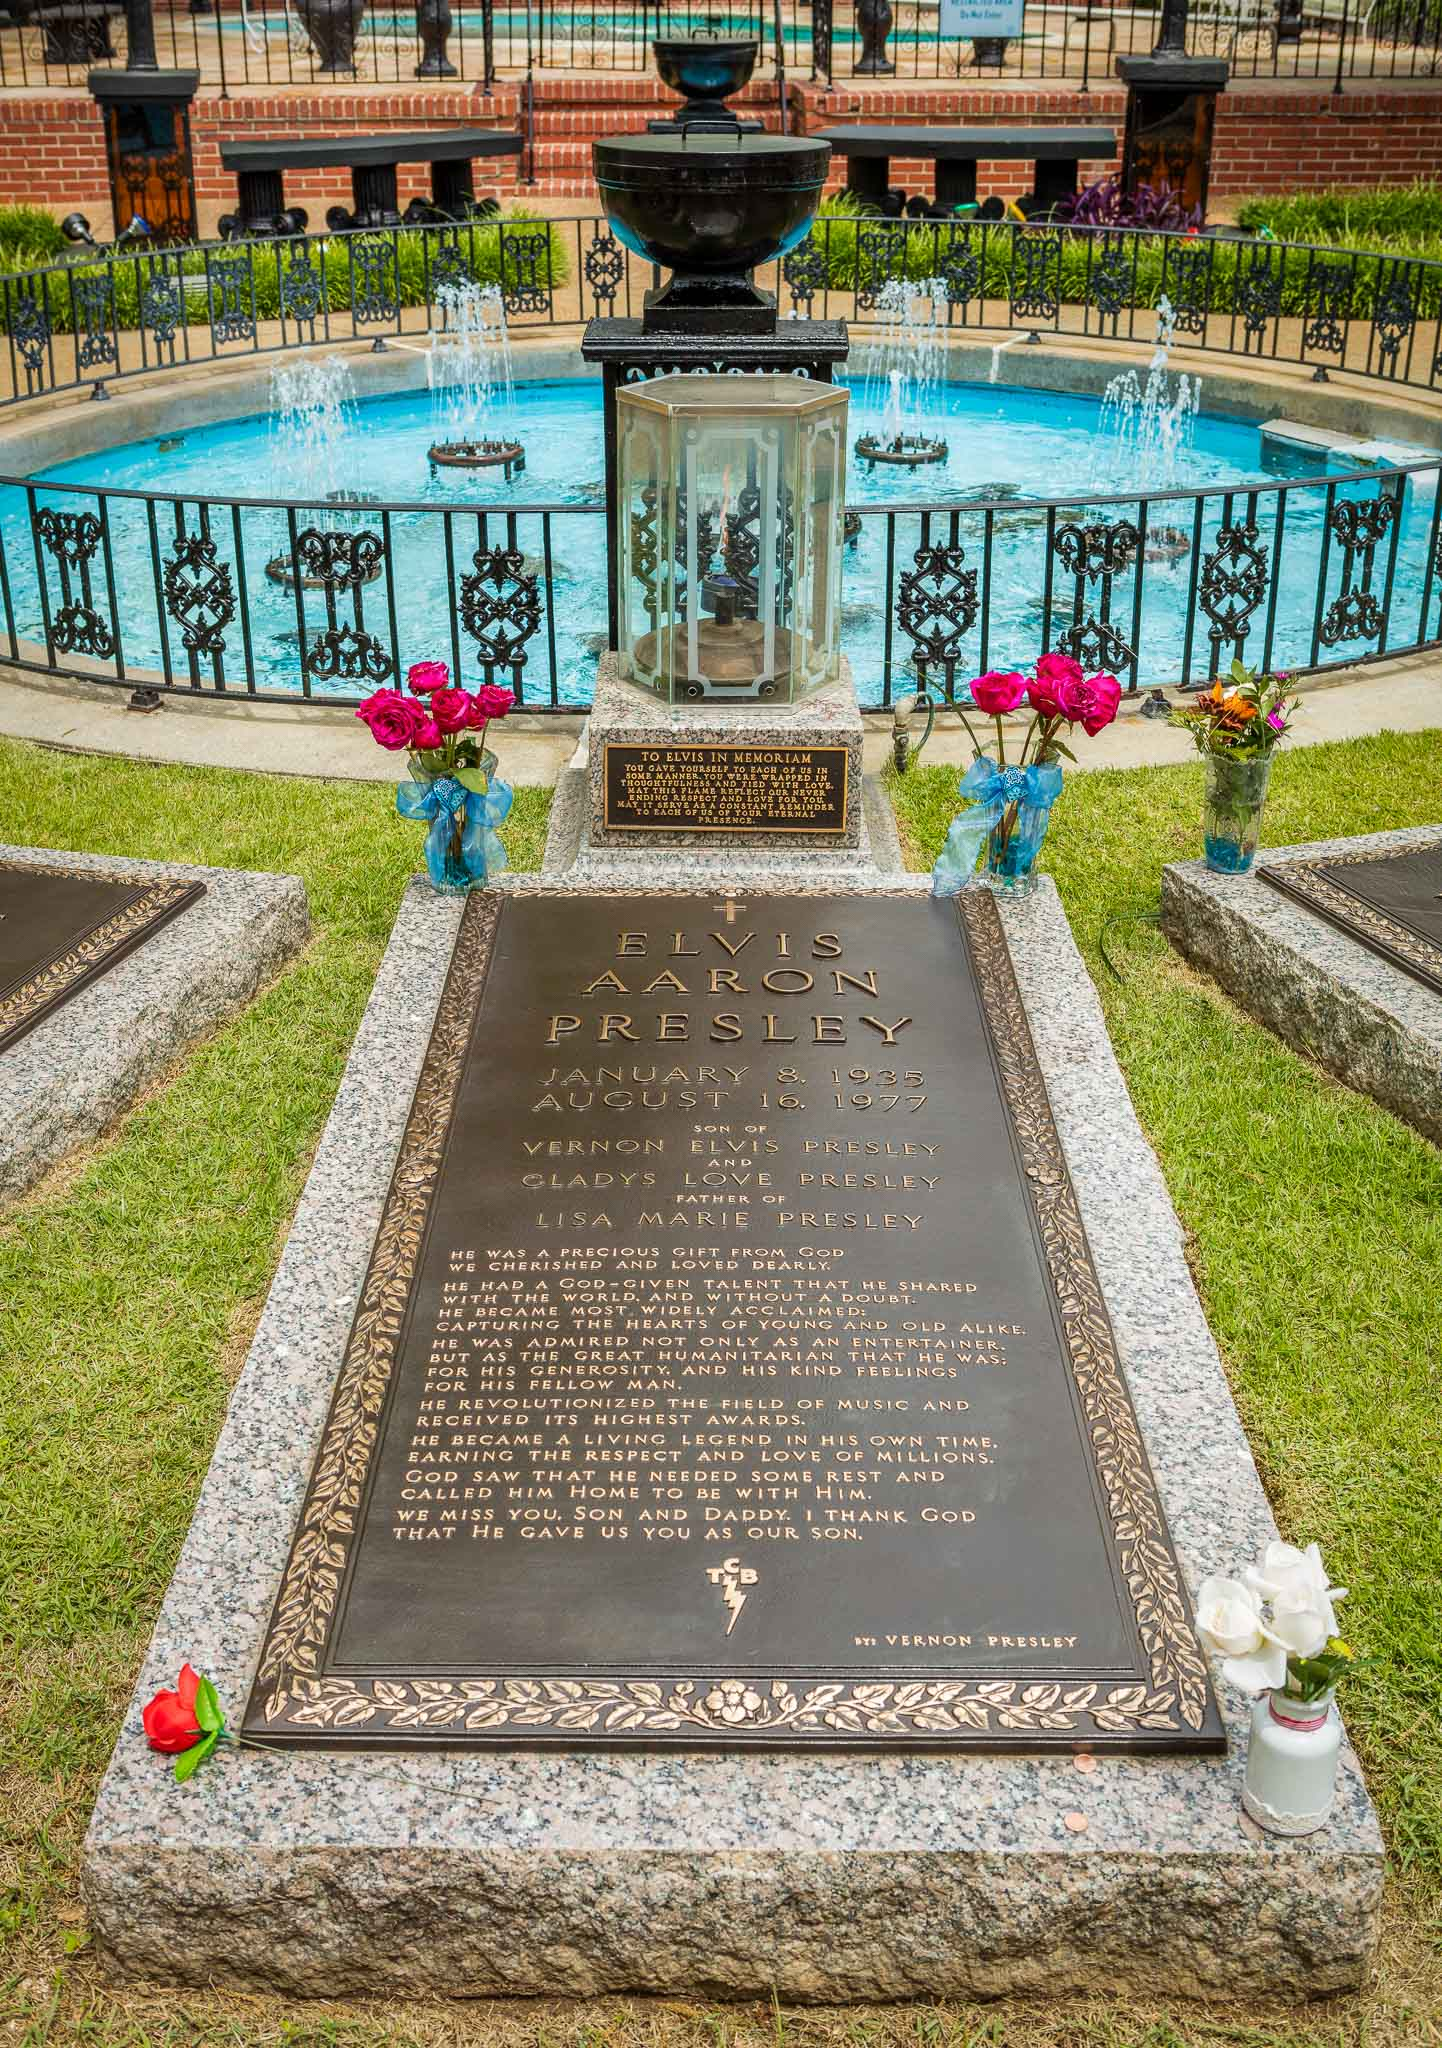 Elvis Presley's Last Resting Place